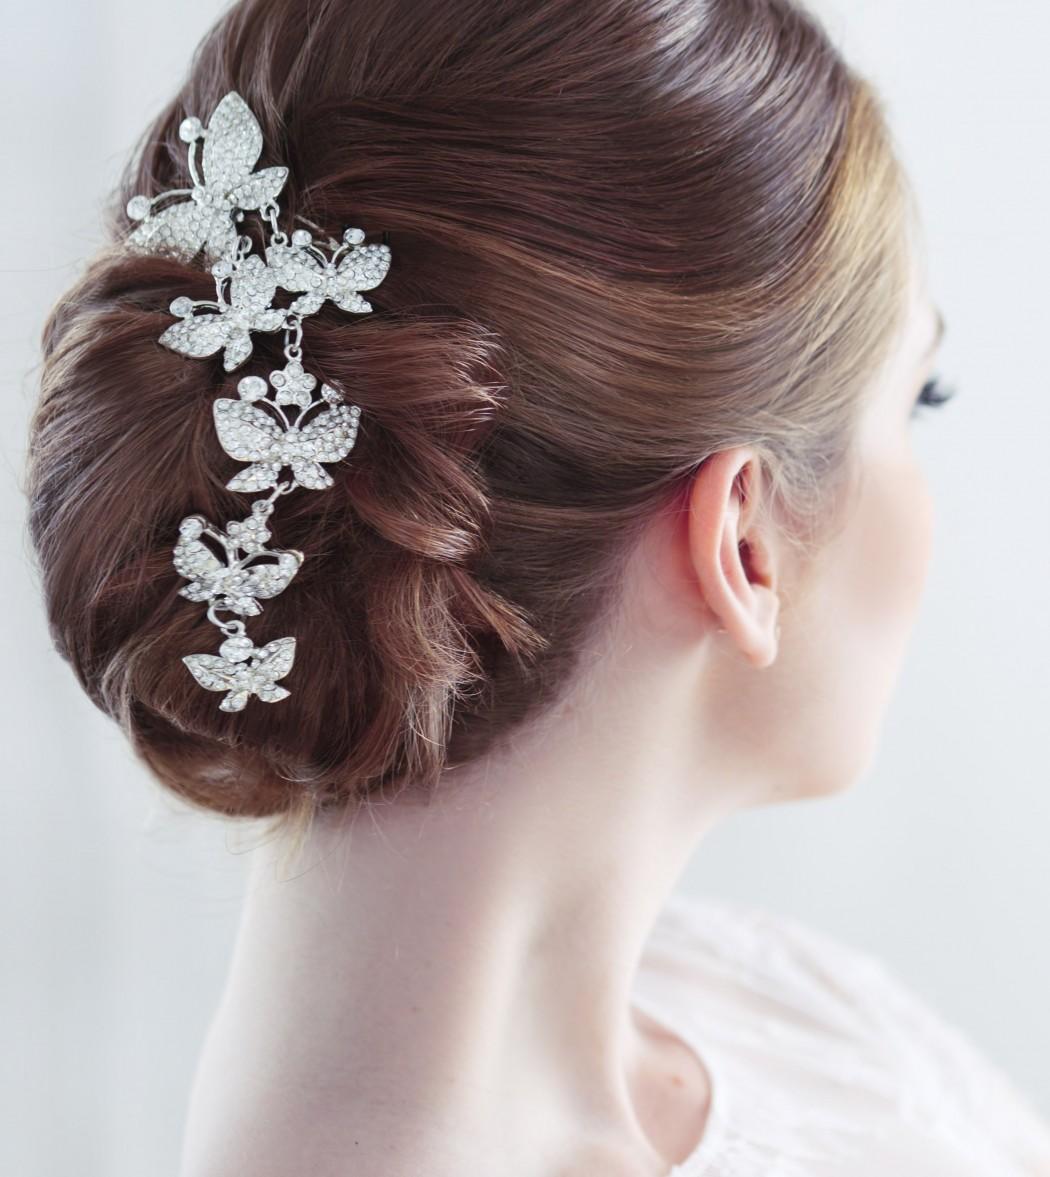 10 Lavish Wedding Hairstyles For Long Hair: Wedding Hairstyles For Long Hair